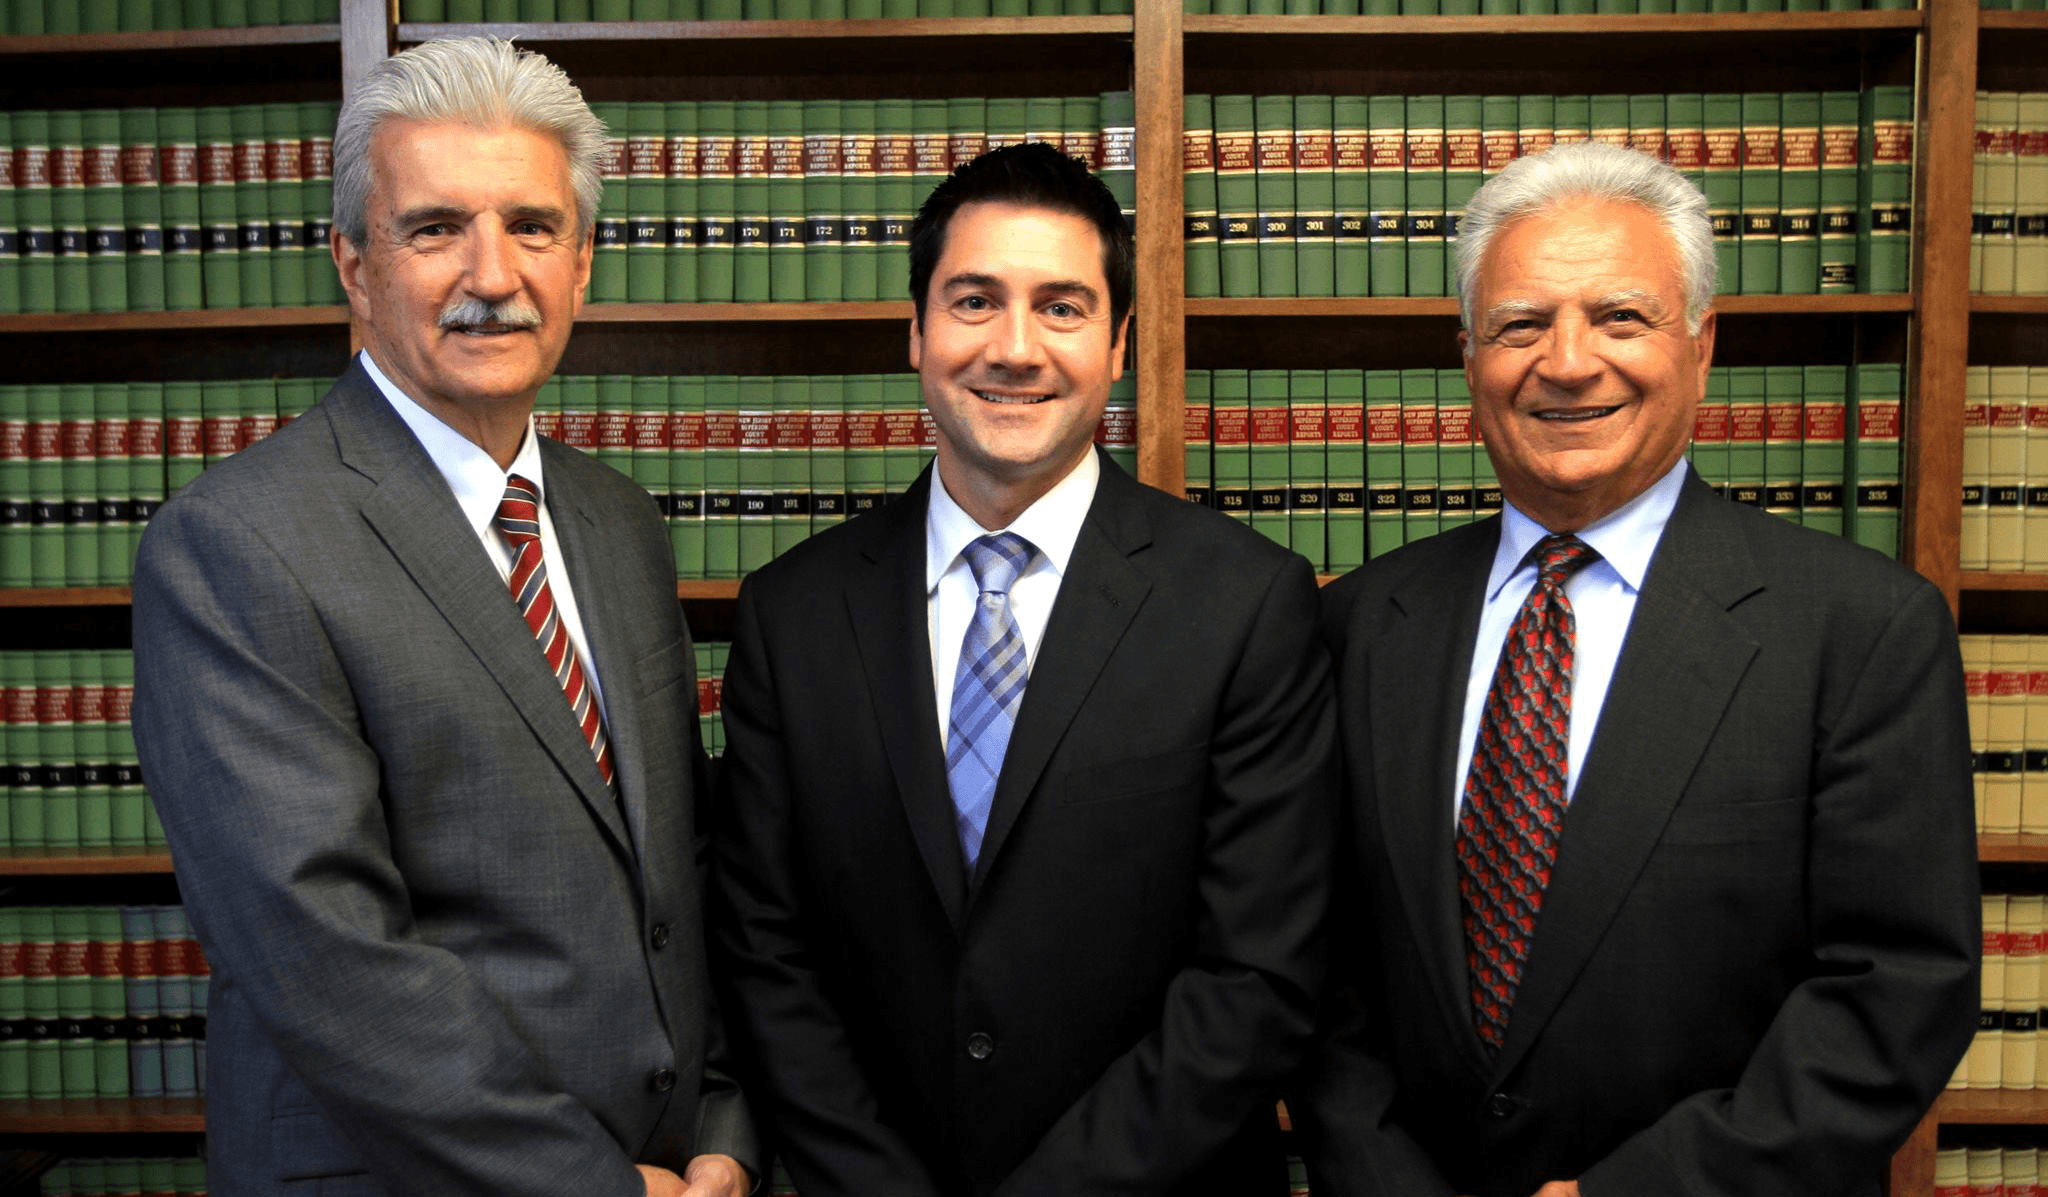 Chiarolanza Deangelis and Digiacomo Attorneys at Law